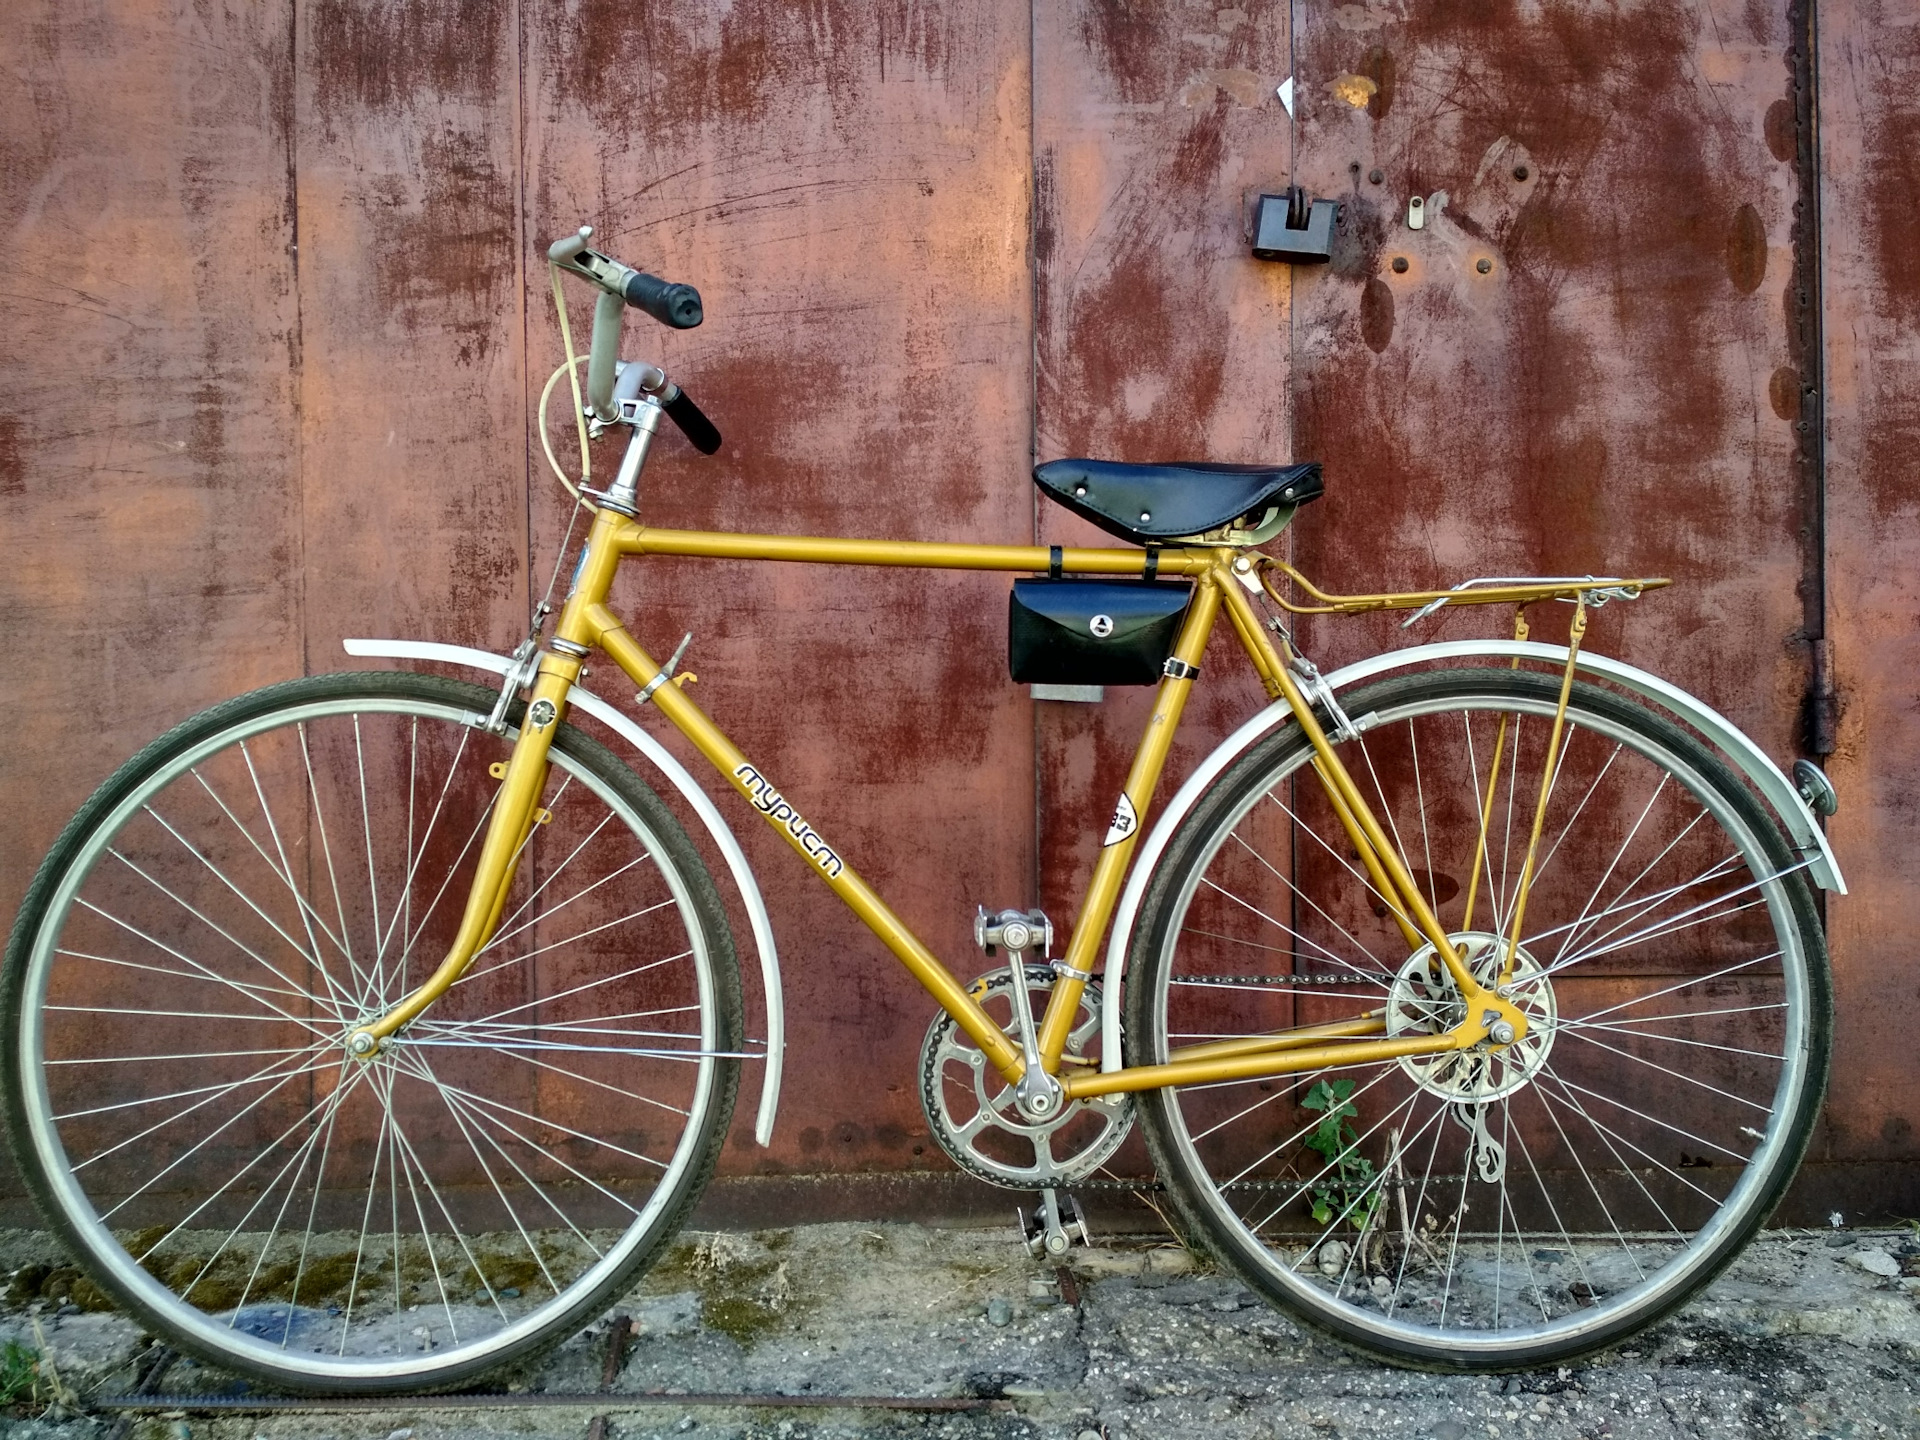 Велосипеды «Турист» производства ХВЗ